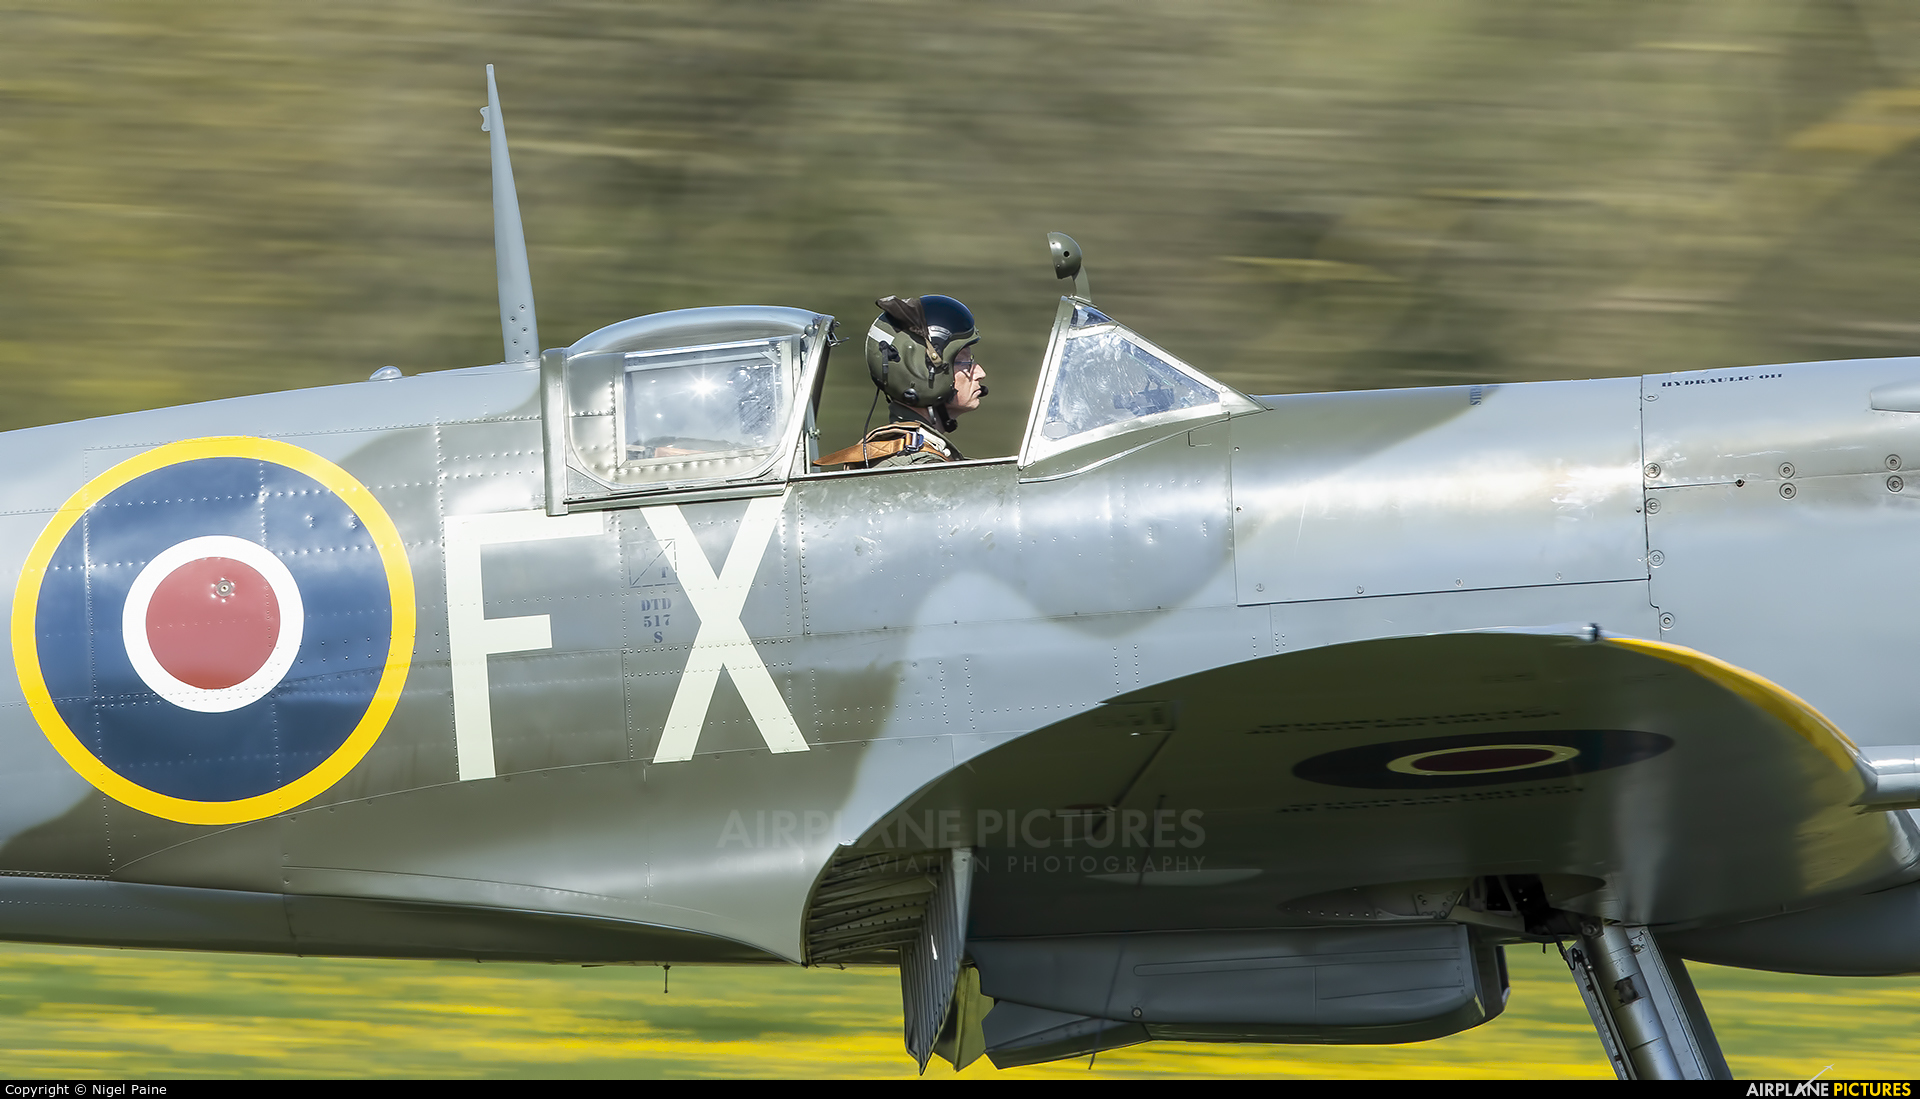 Aero Legends G-CGYJ aircraft at Lashenden / Headcorn